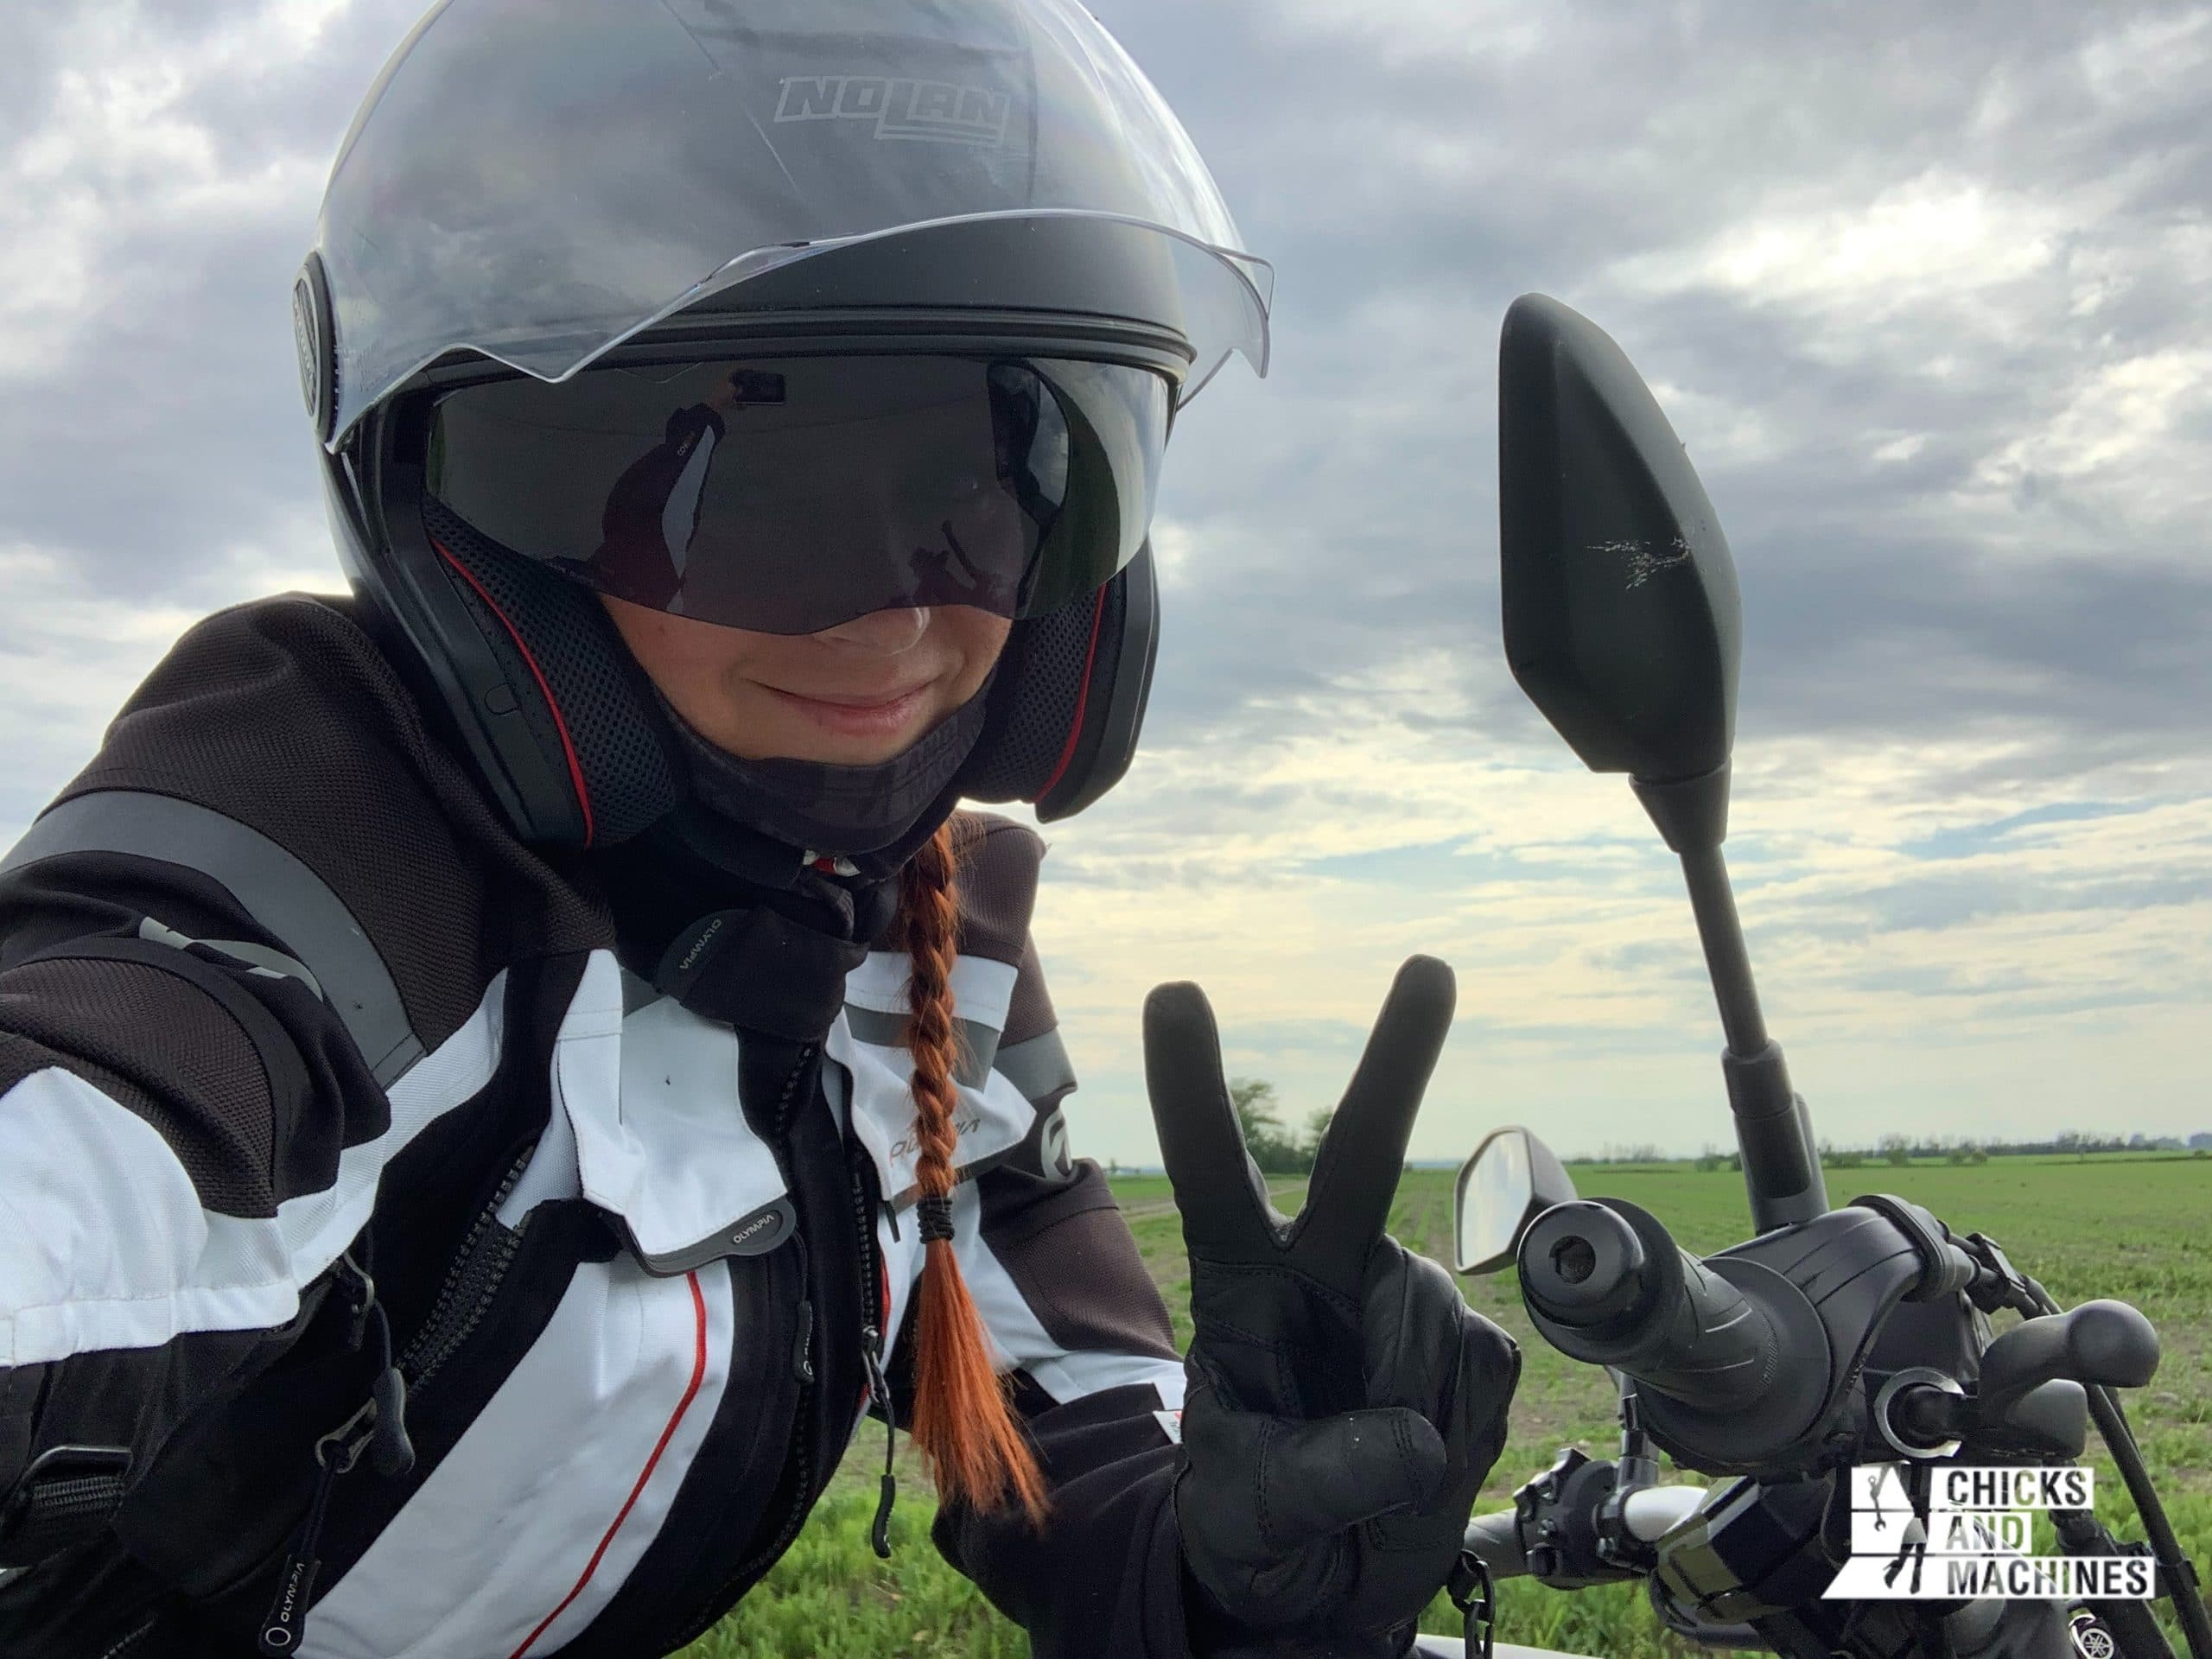 Caro with her modular helmet trying the 2021 Yamaha MT-07